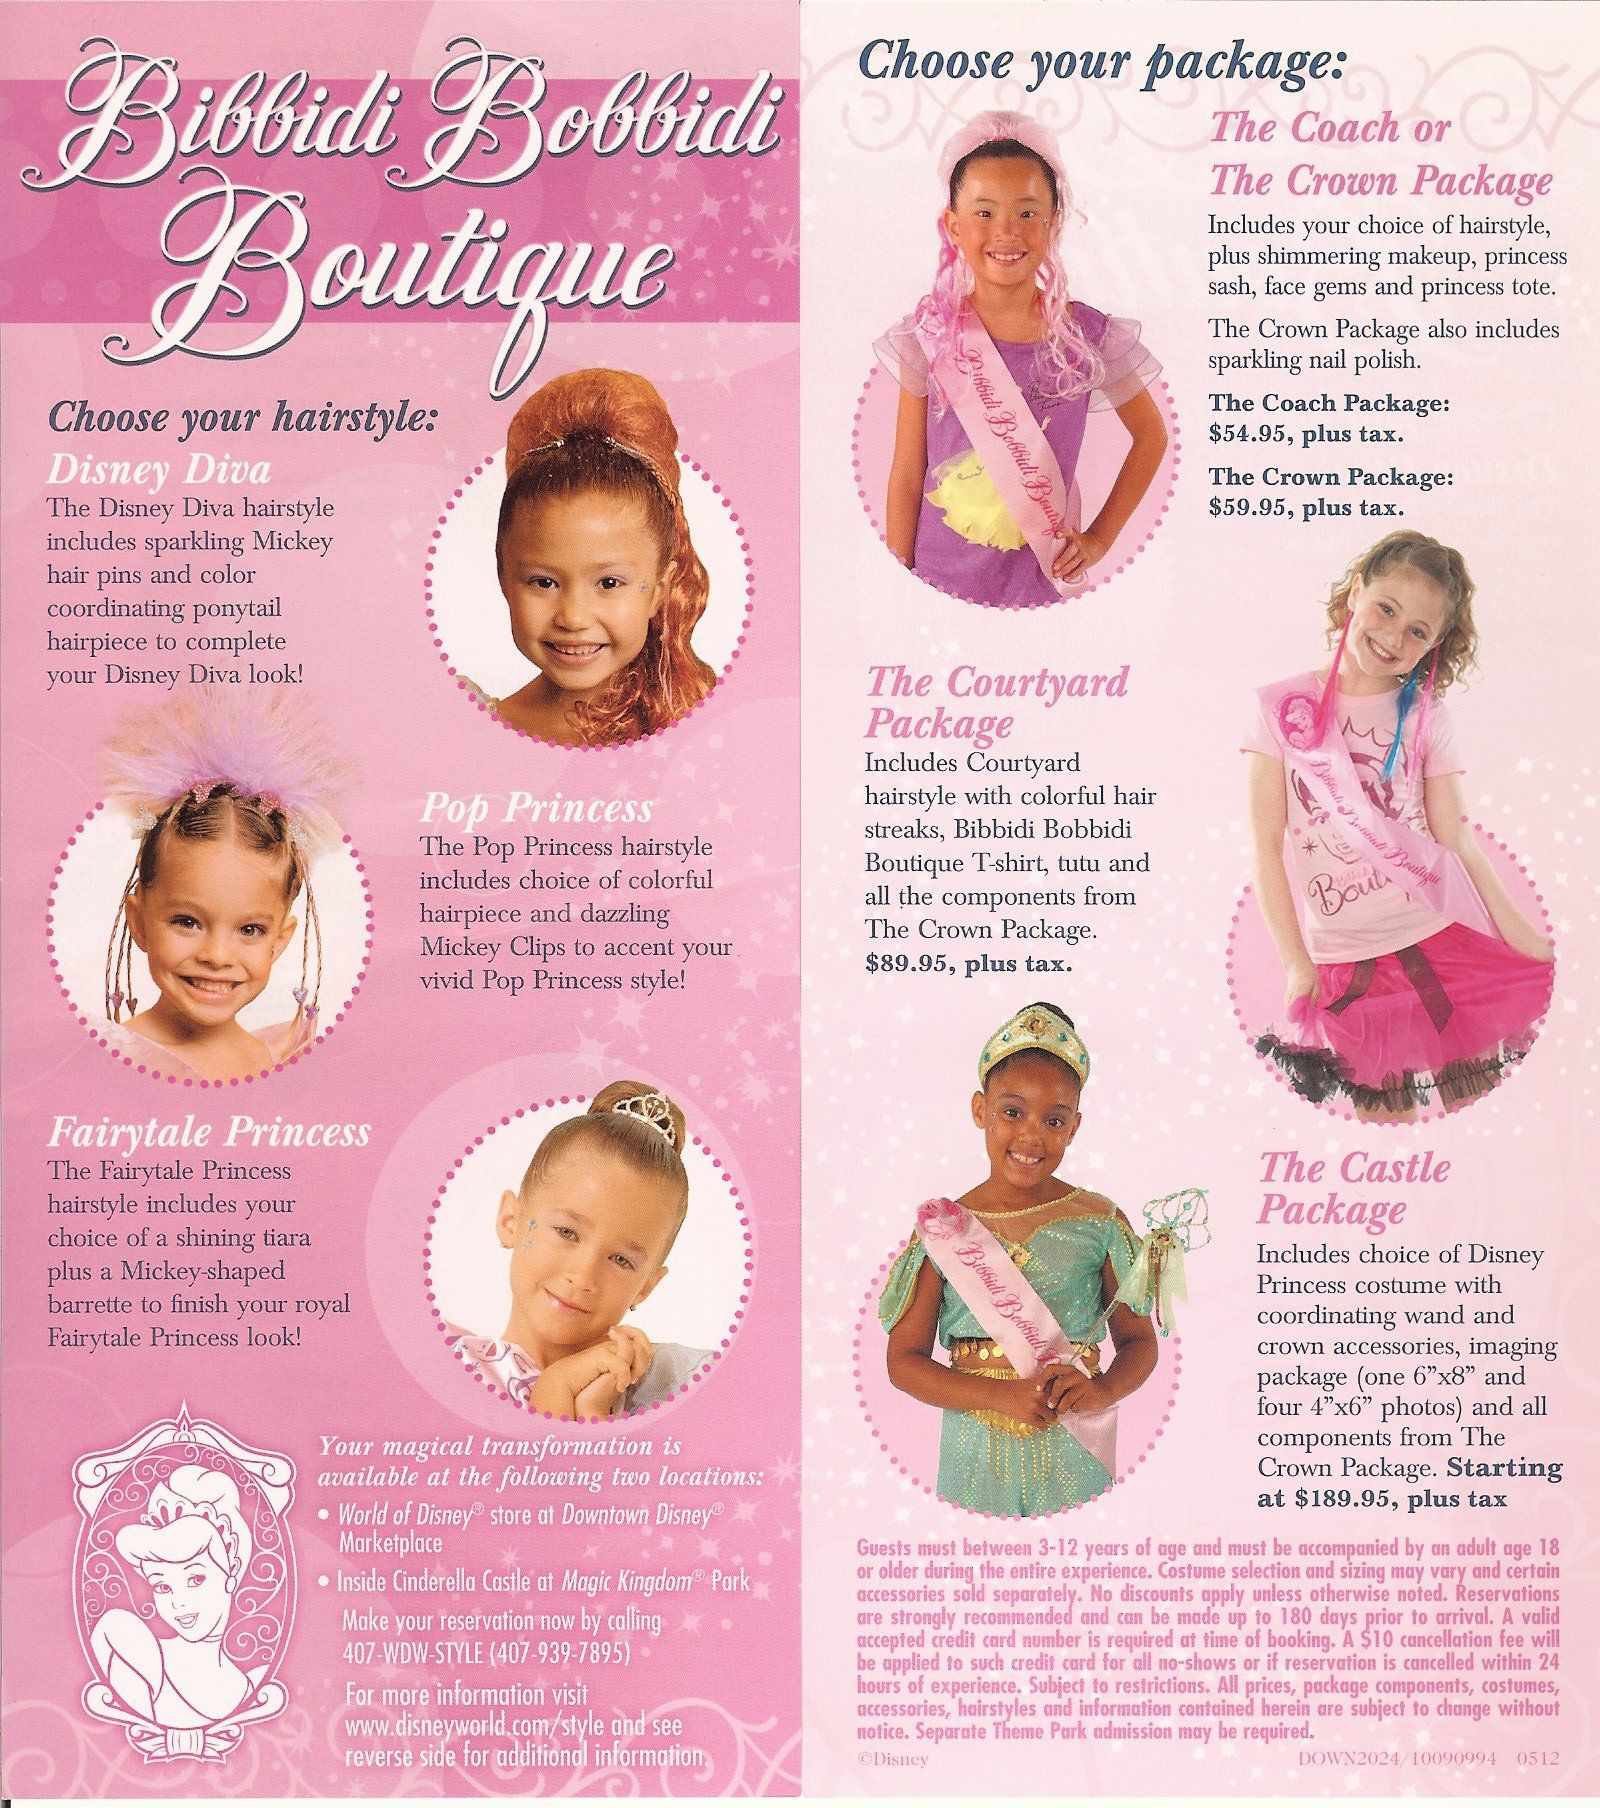 Best ideas about Bibbidi Bobbidi Boutique Hairstyles 2019 . Save or Pin Bibbidi Bobbidi Boutique Brochure Now.